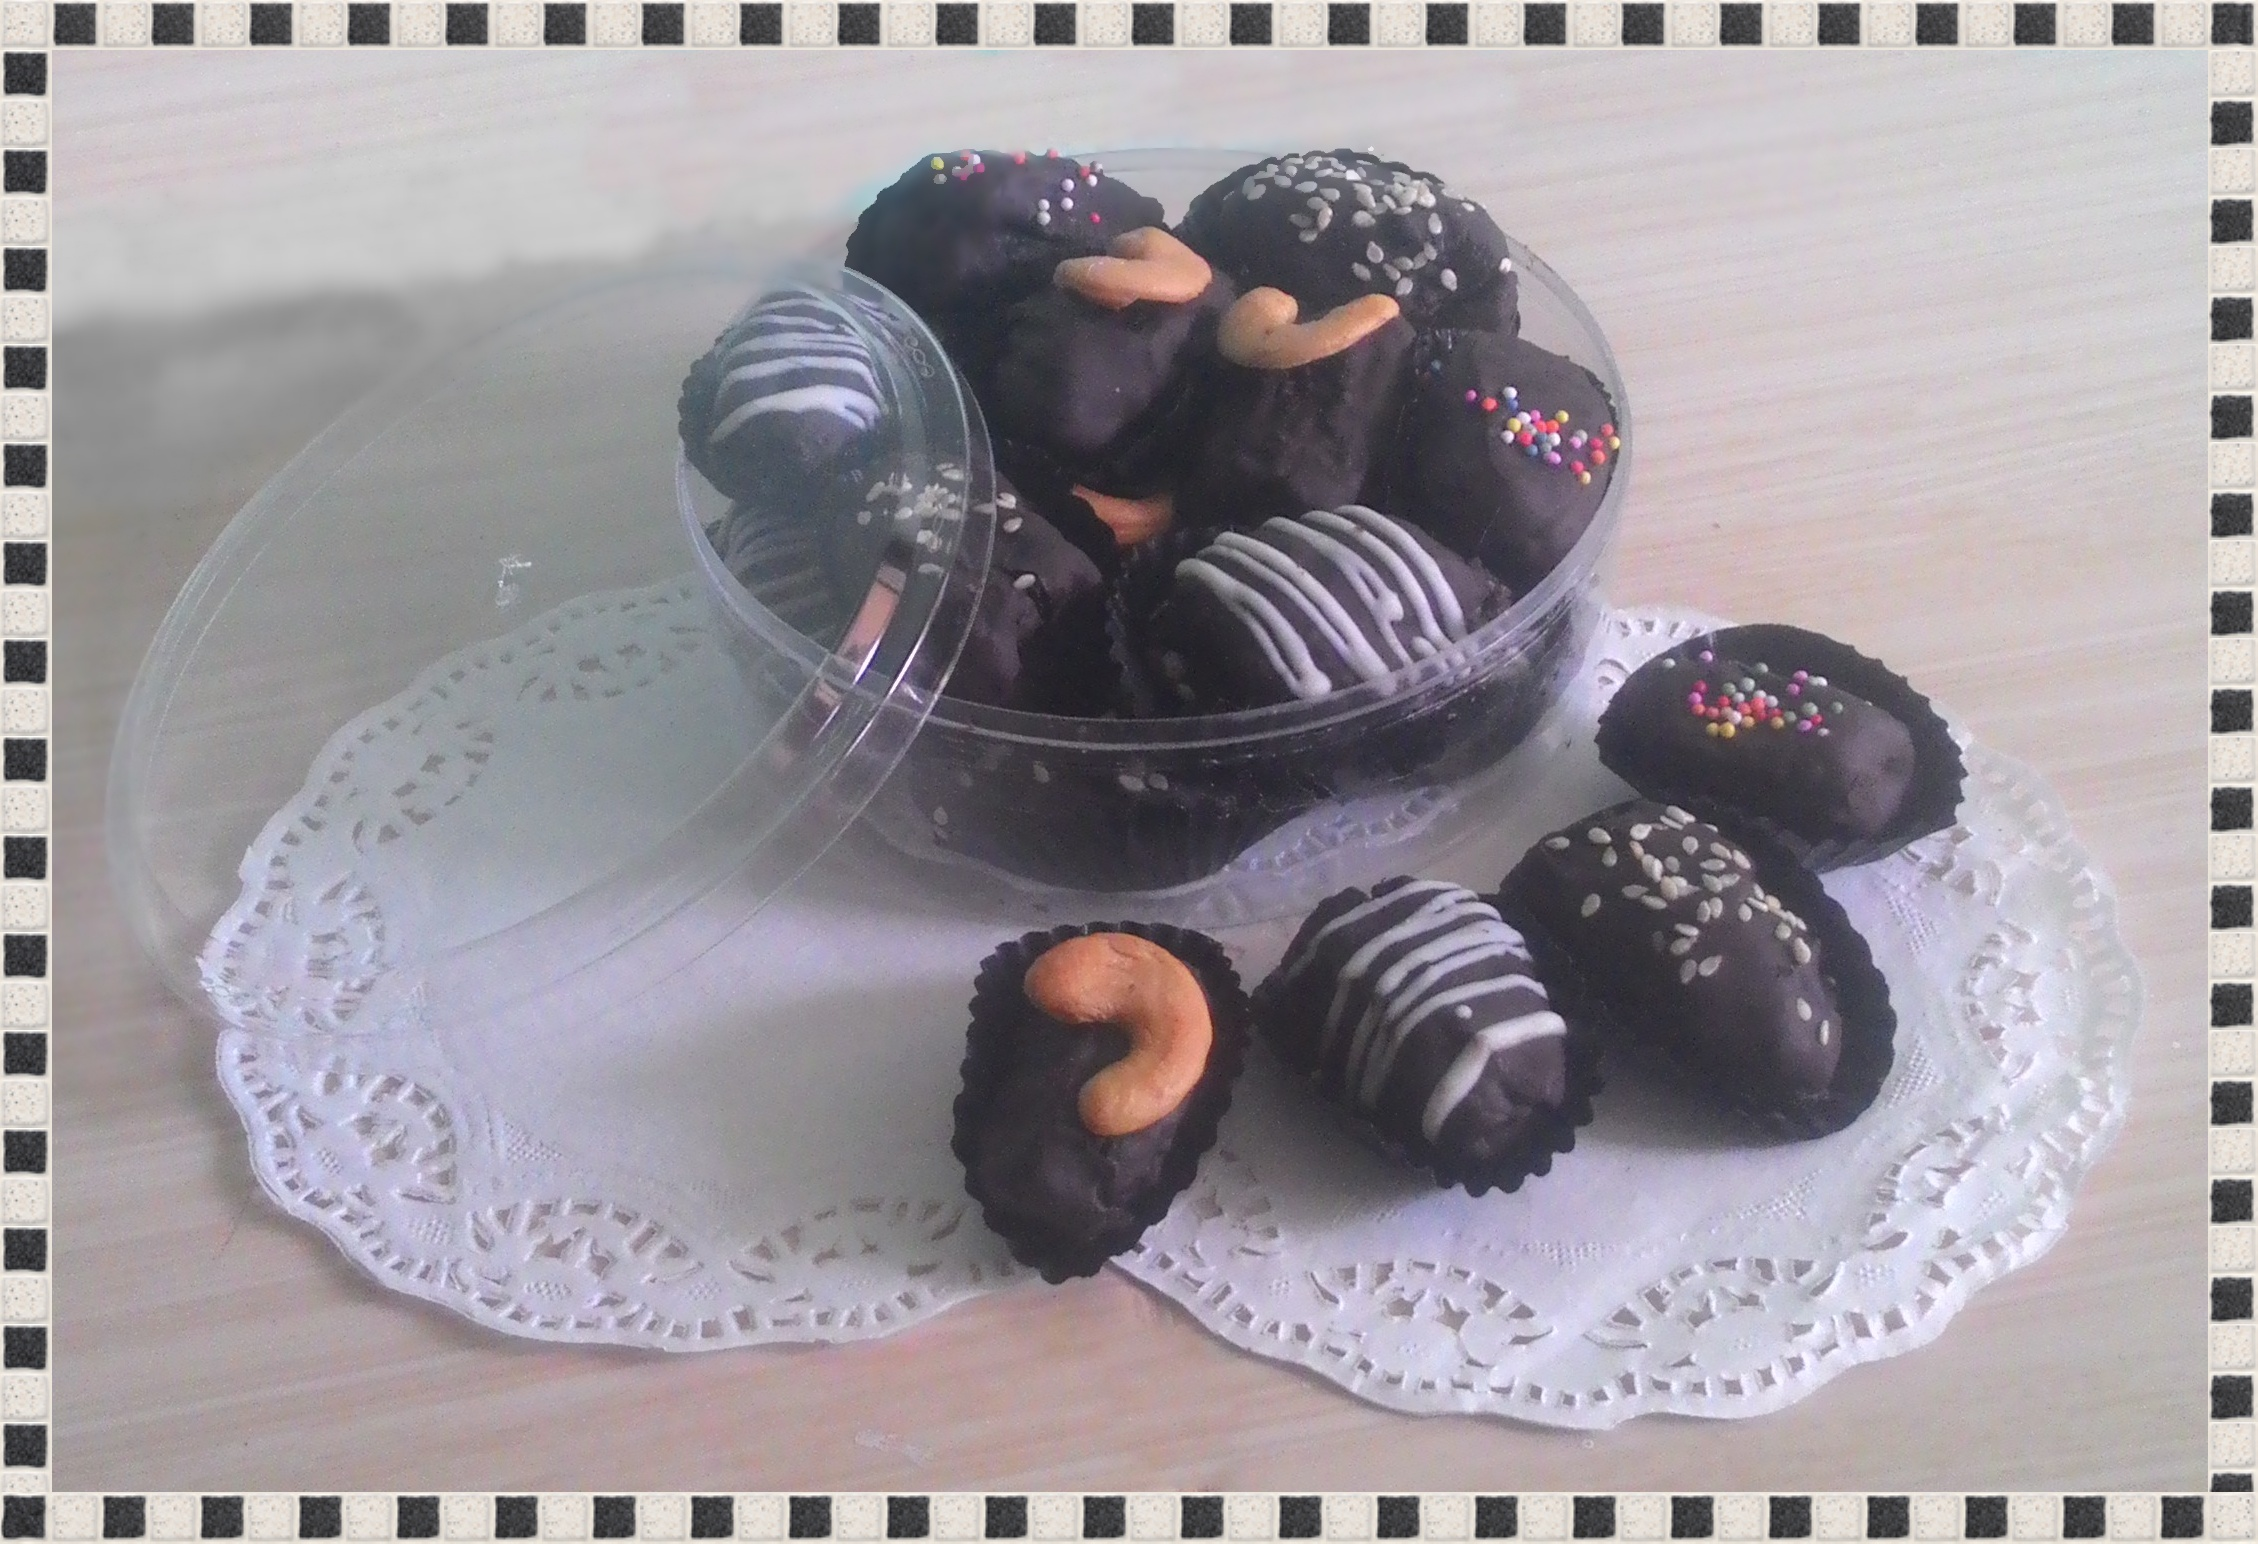 Buy Kurma Coklat Isi Mede Keju Selai Strawberry Blueberry Lembutnya Terbalut Manisnya Dengan Isian Aneka Rasa Dan Topping Yang Cantik